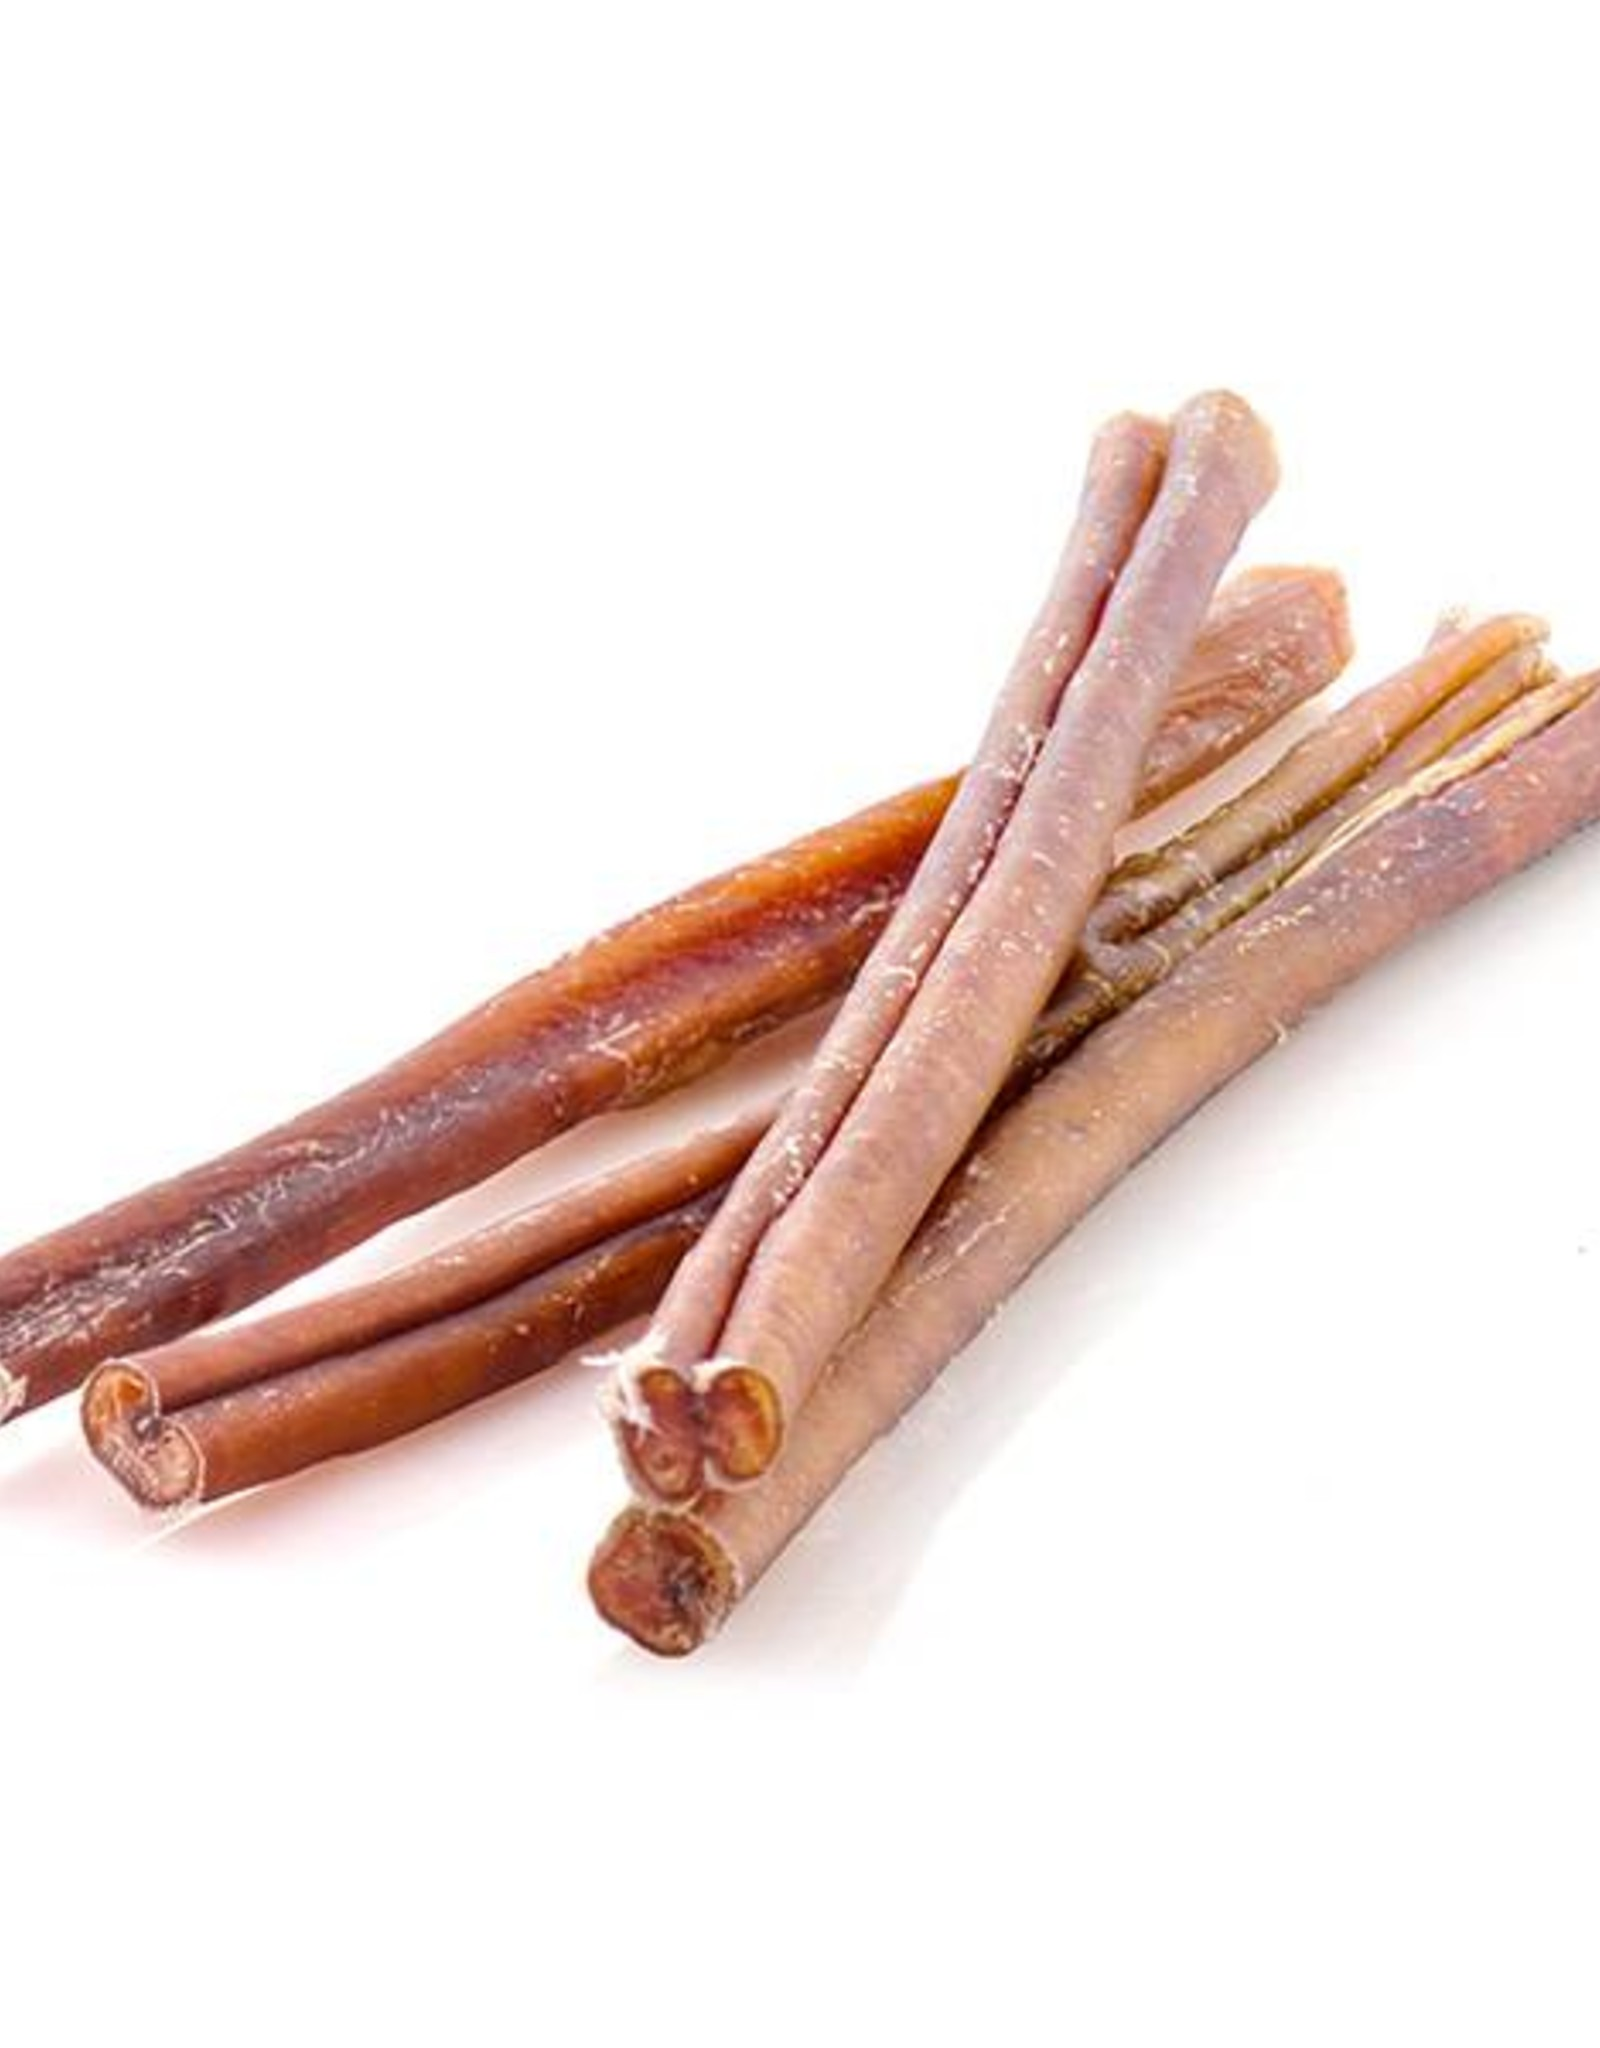 "Bully Sticks 12"" Standard Bully Stick (Odor Free)"